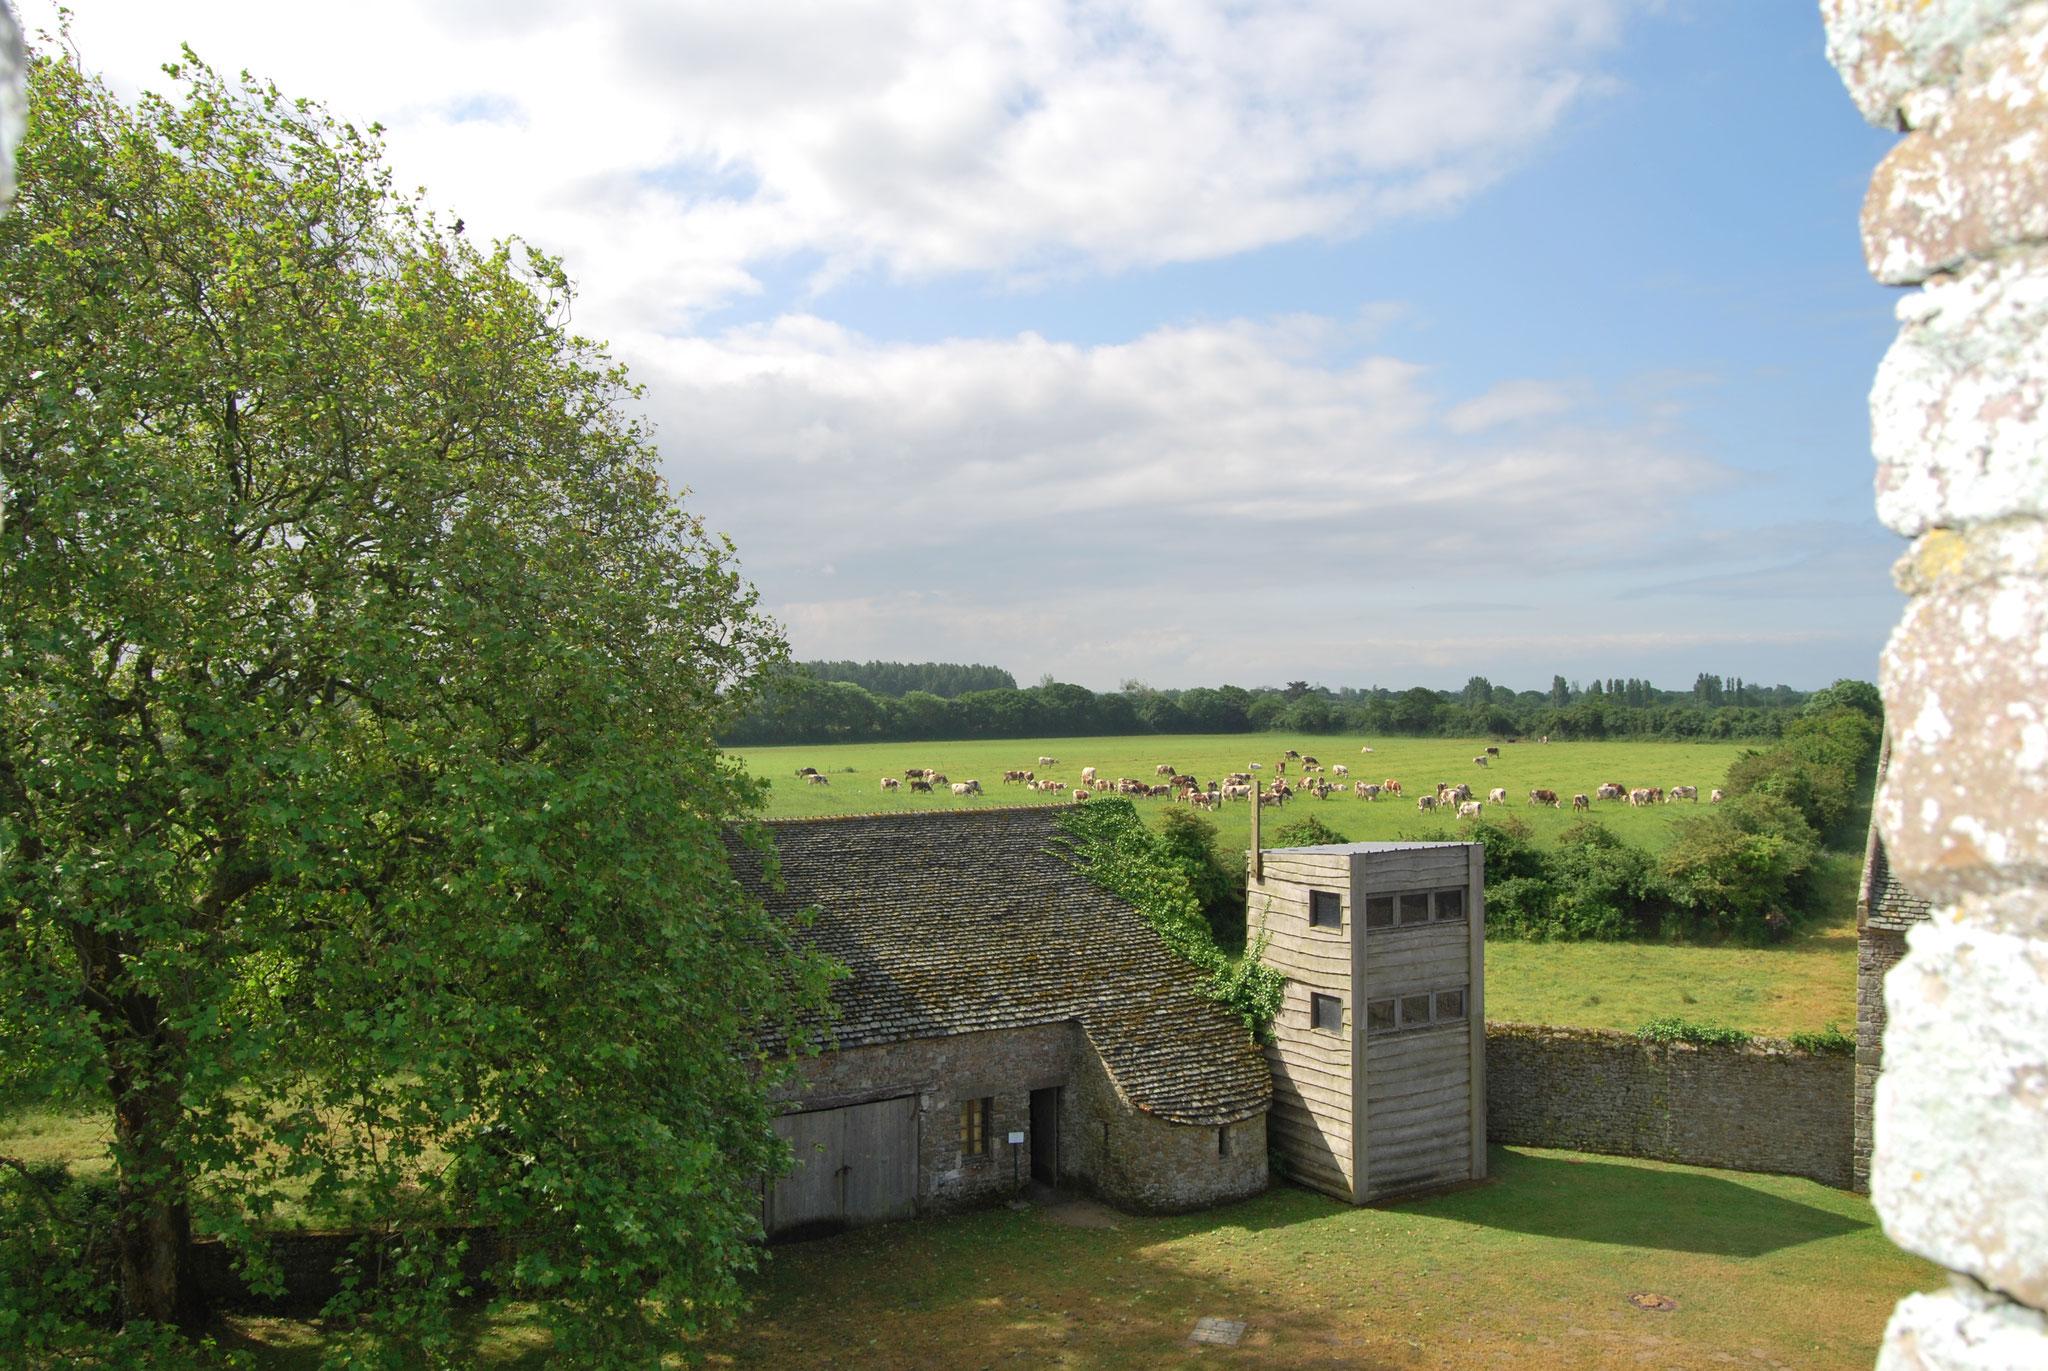 Château de Pirou